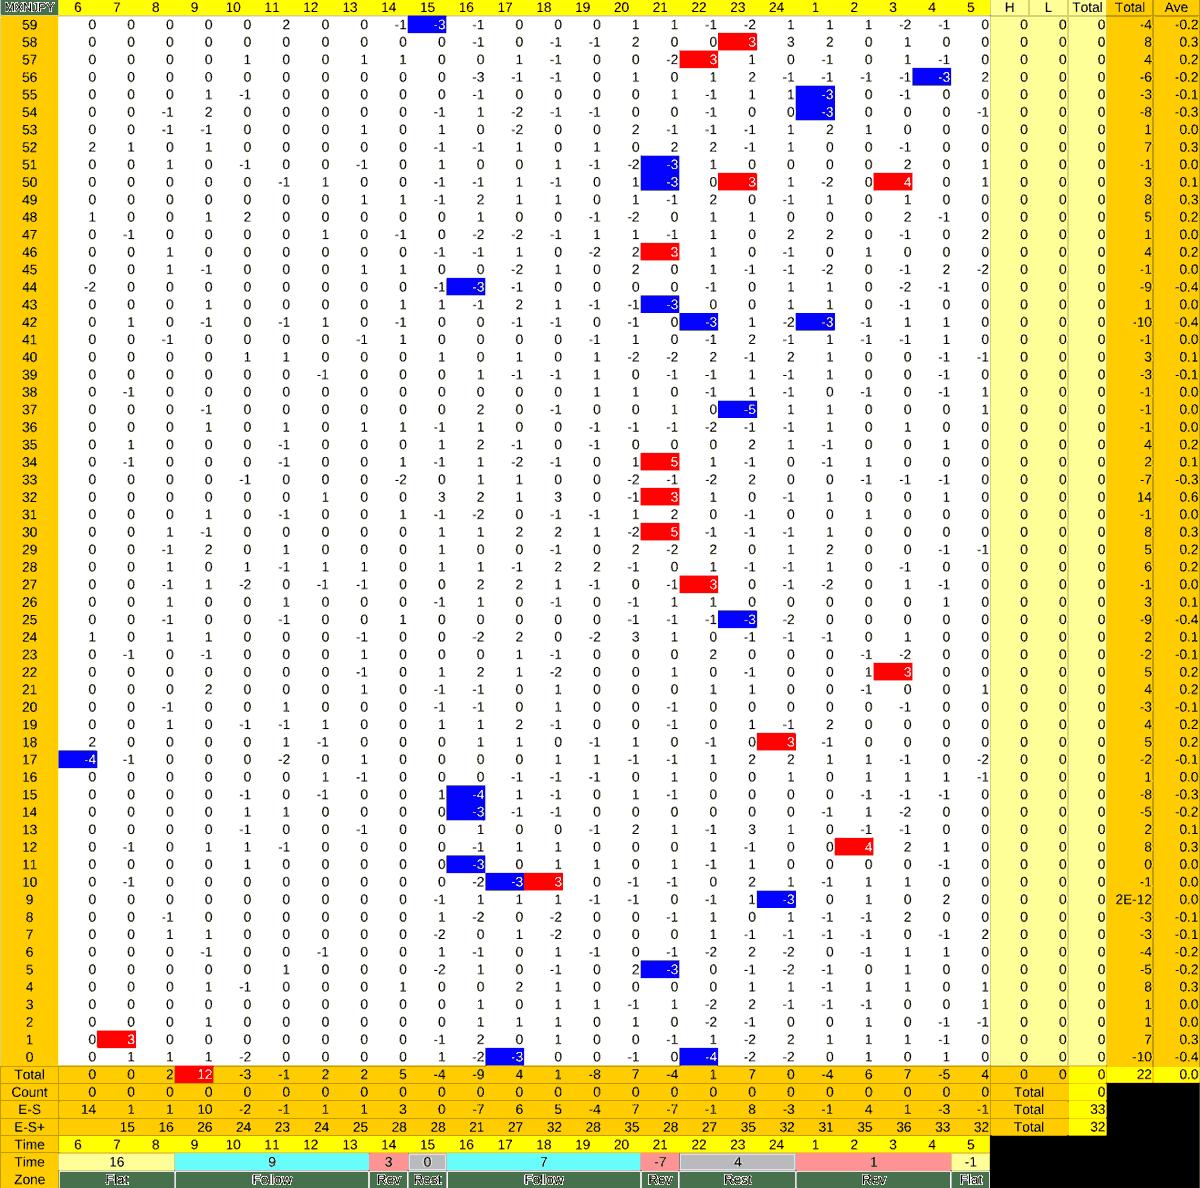 20210714_HS(3)MXNJPY